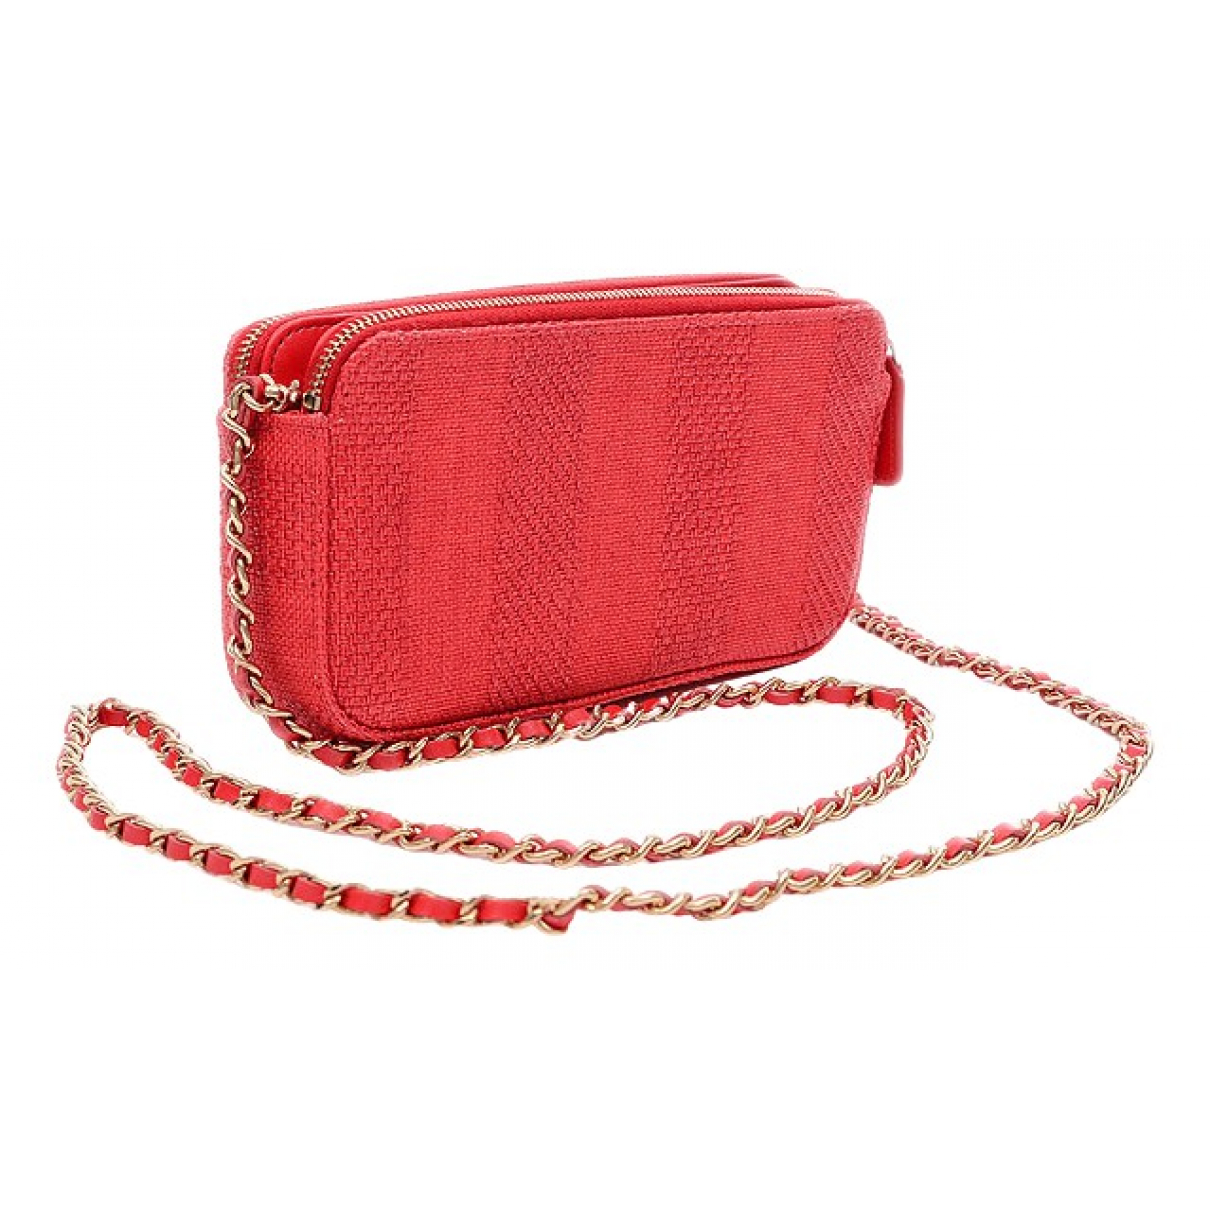 Chanel Deauville Clutch in  Rot Leinen